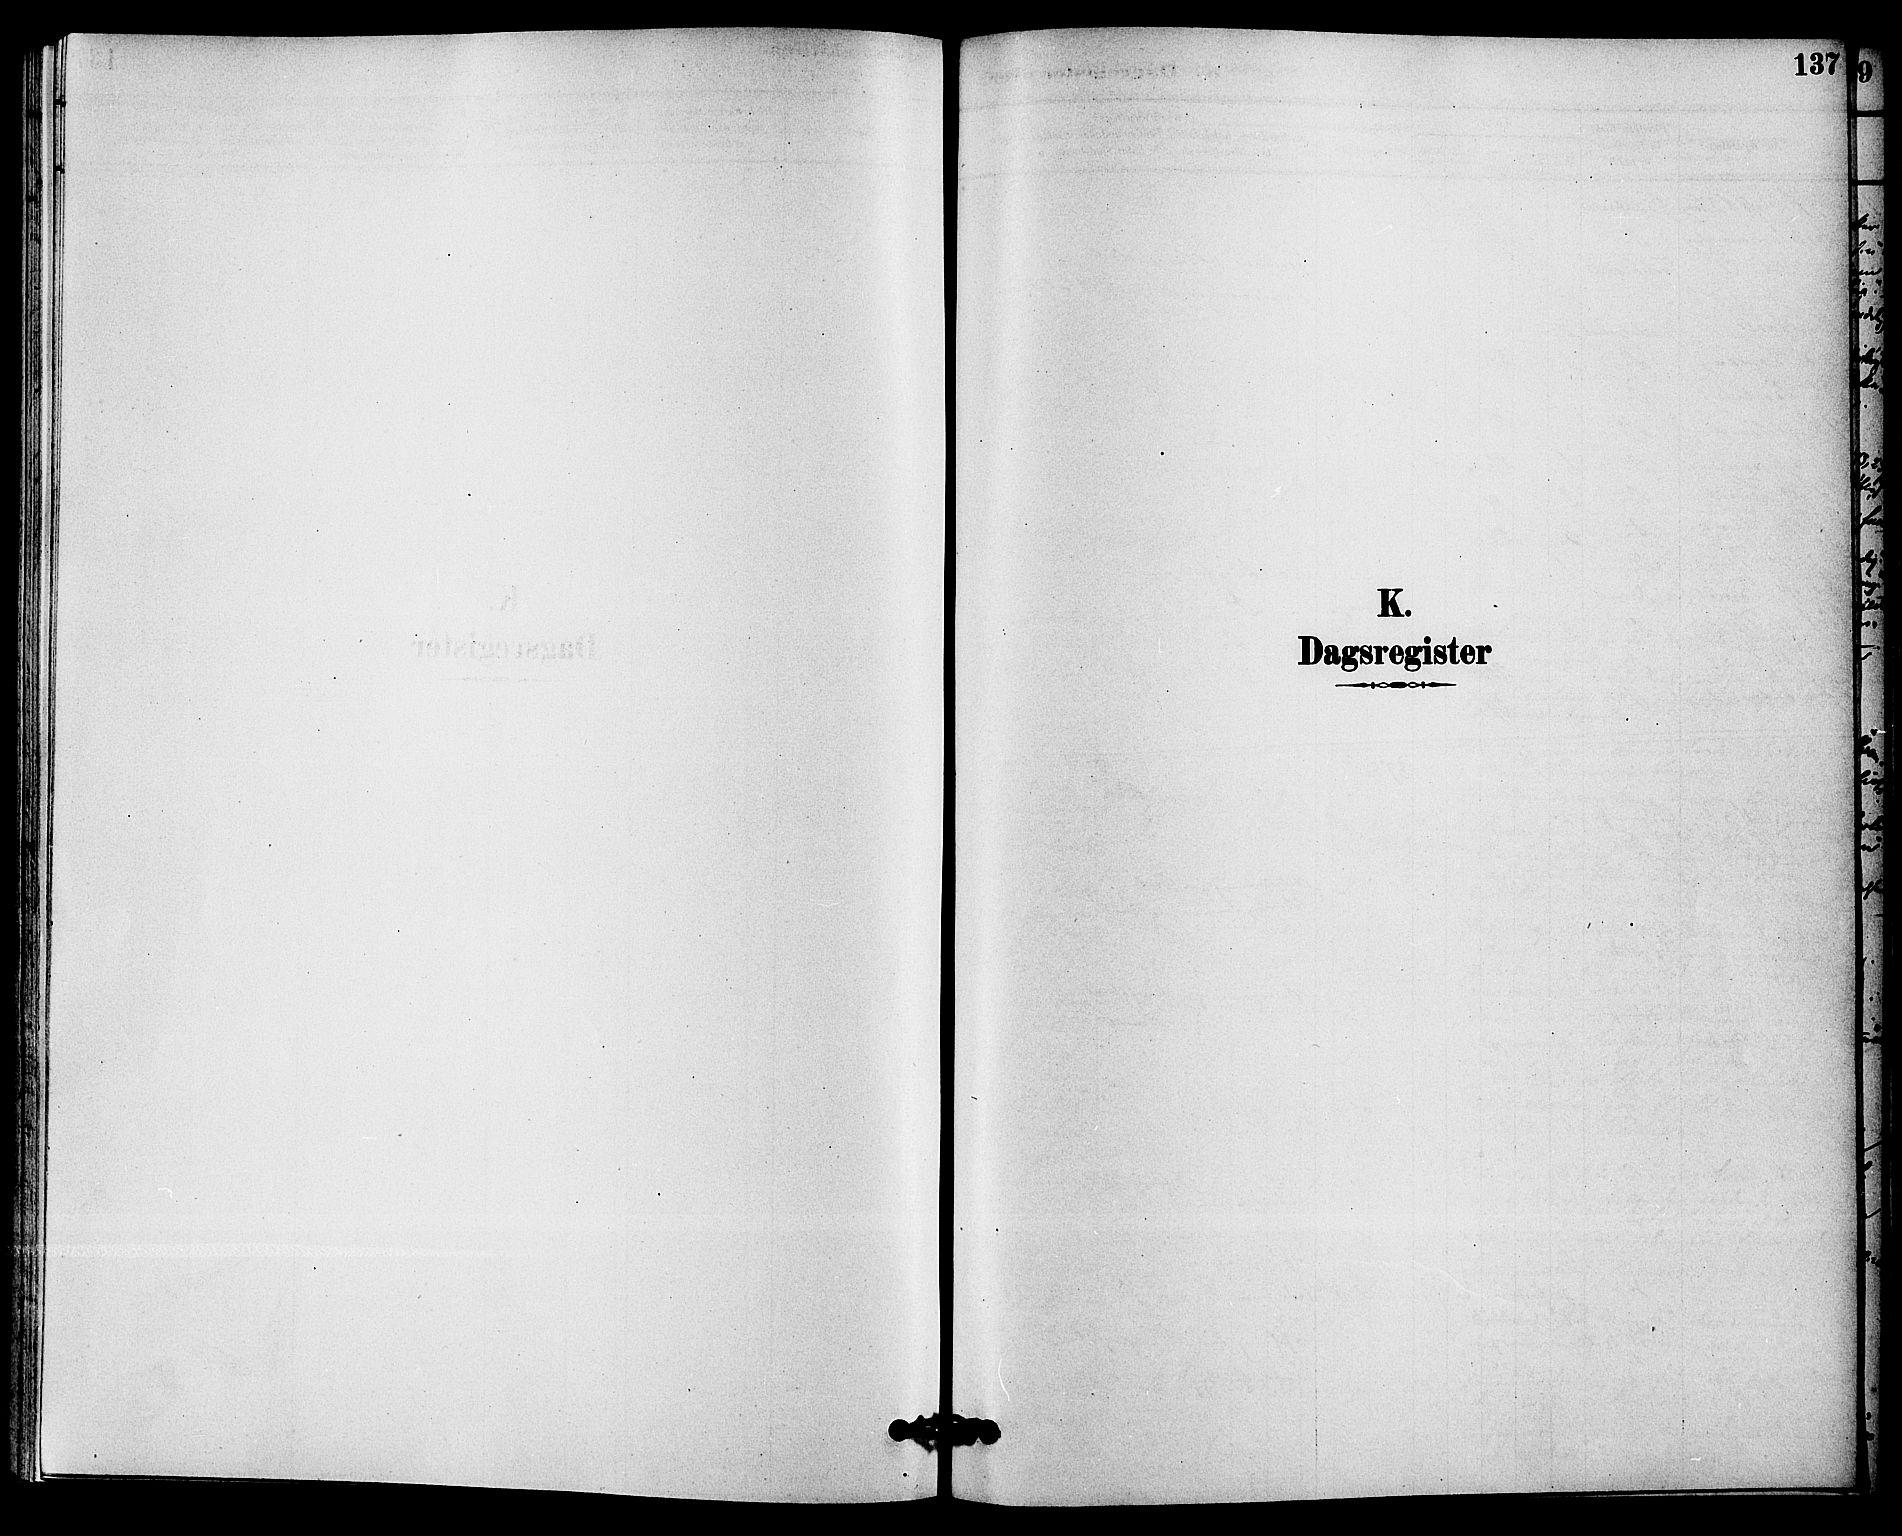 SAKO, Solum kirkebøker, F/Fc/L0001: Ministerialbok nr. III 1, 1877-1891, s. 137